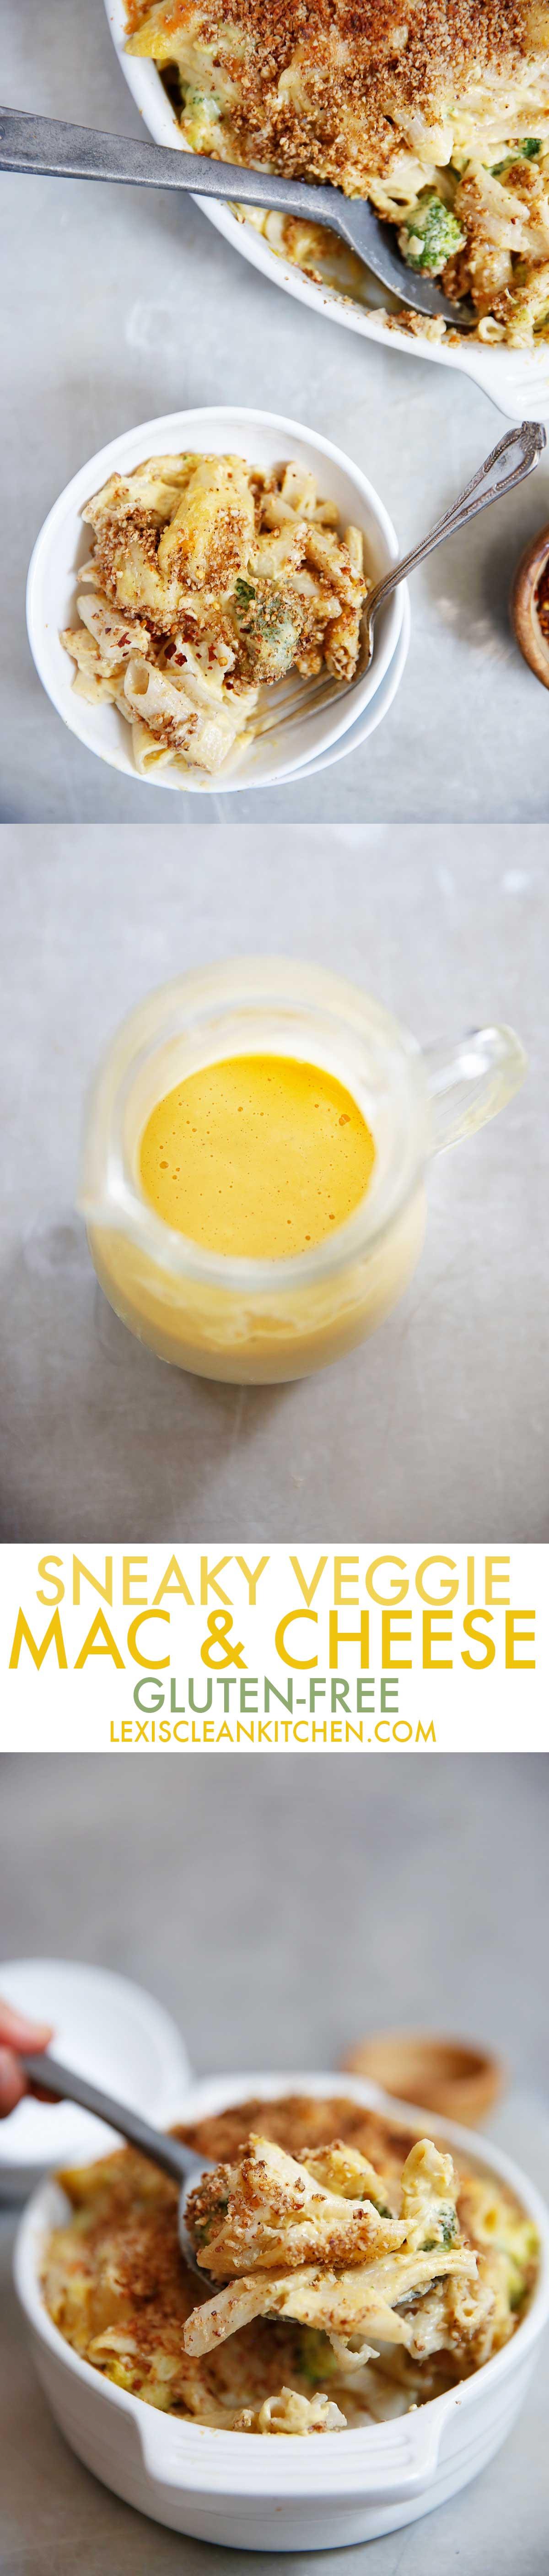 Sneaky Veggie Gluten Free Mac and Cheese Pecan Breadcrumbs | Lexi's Clean Kitchen